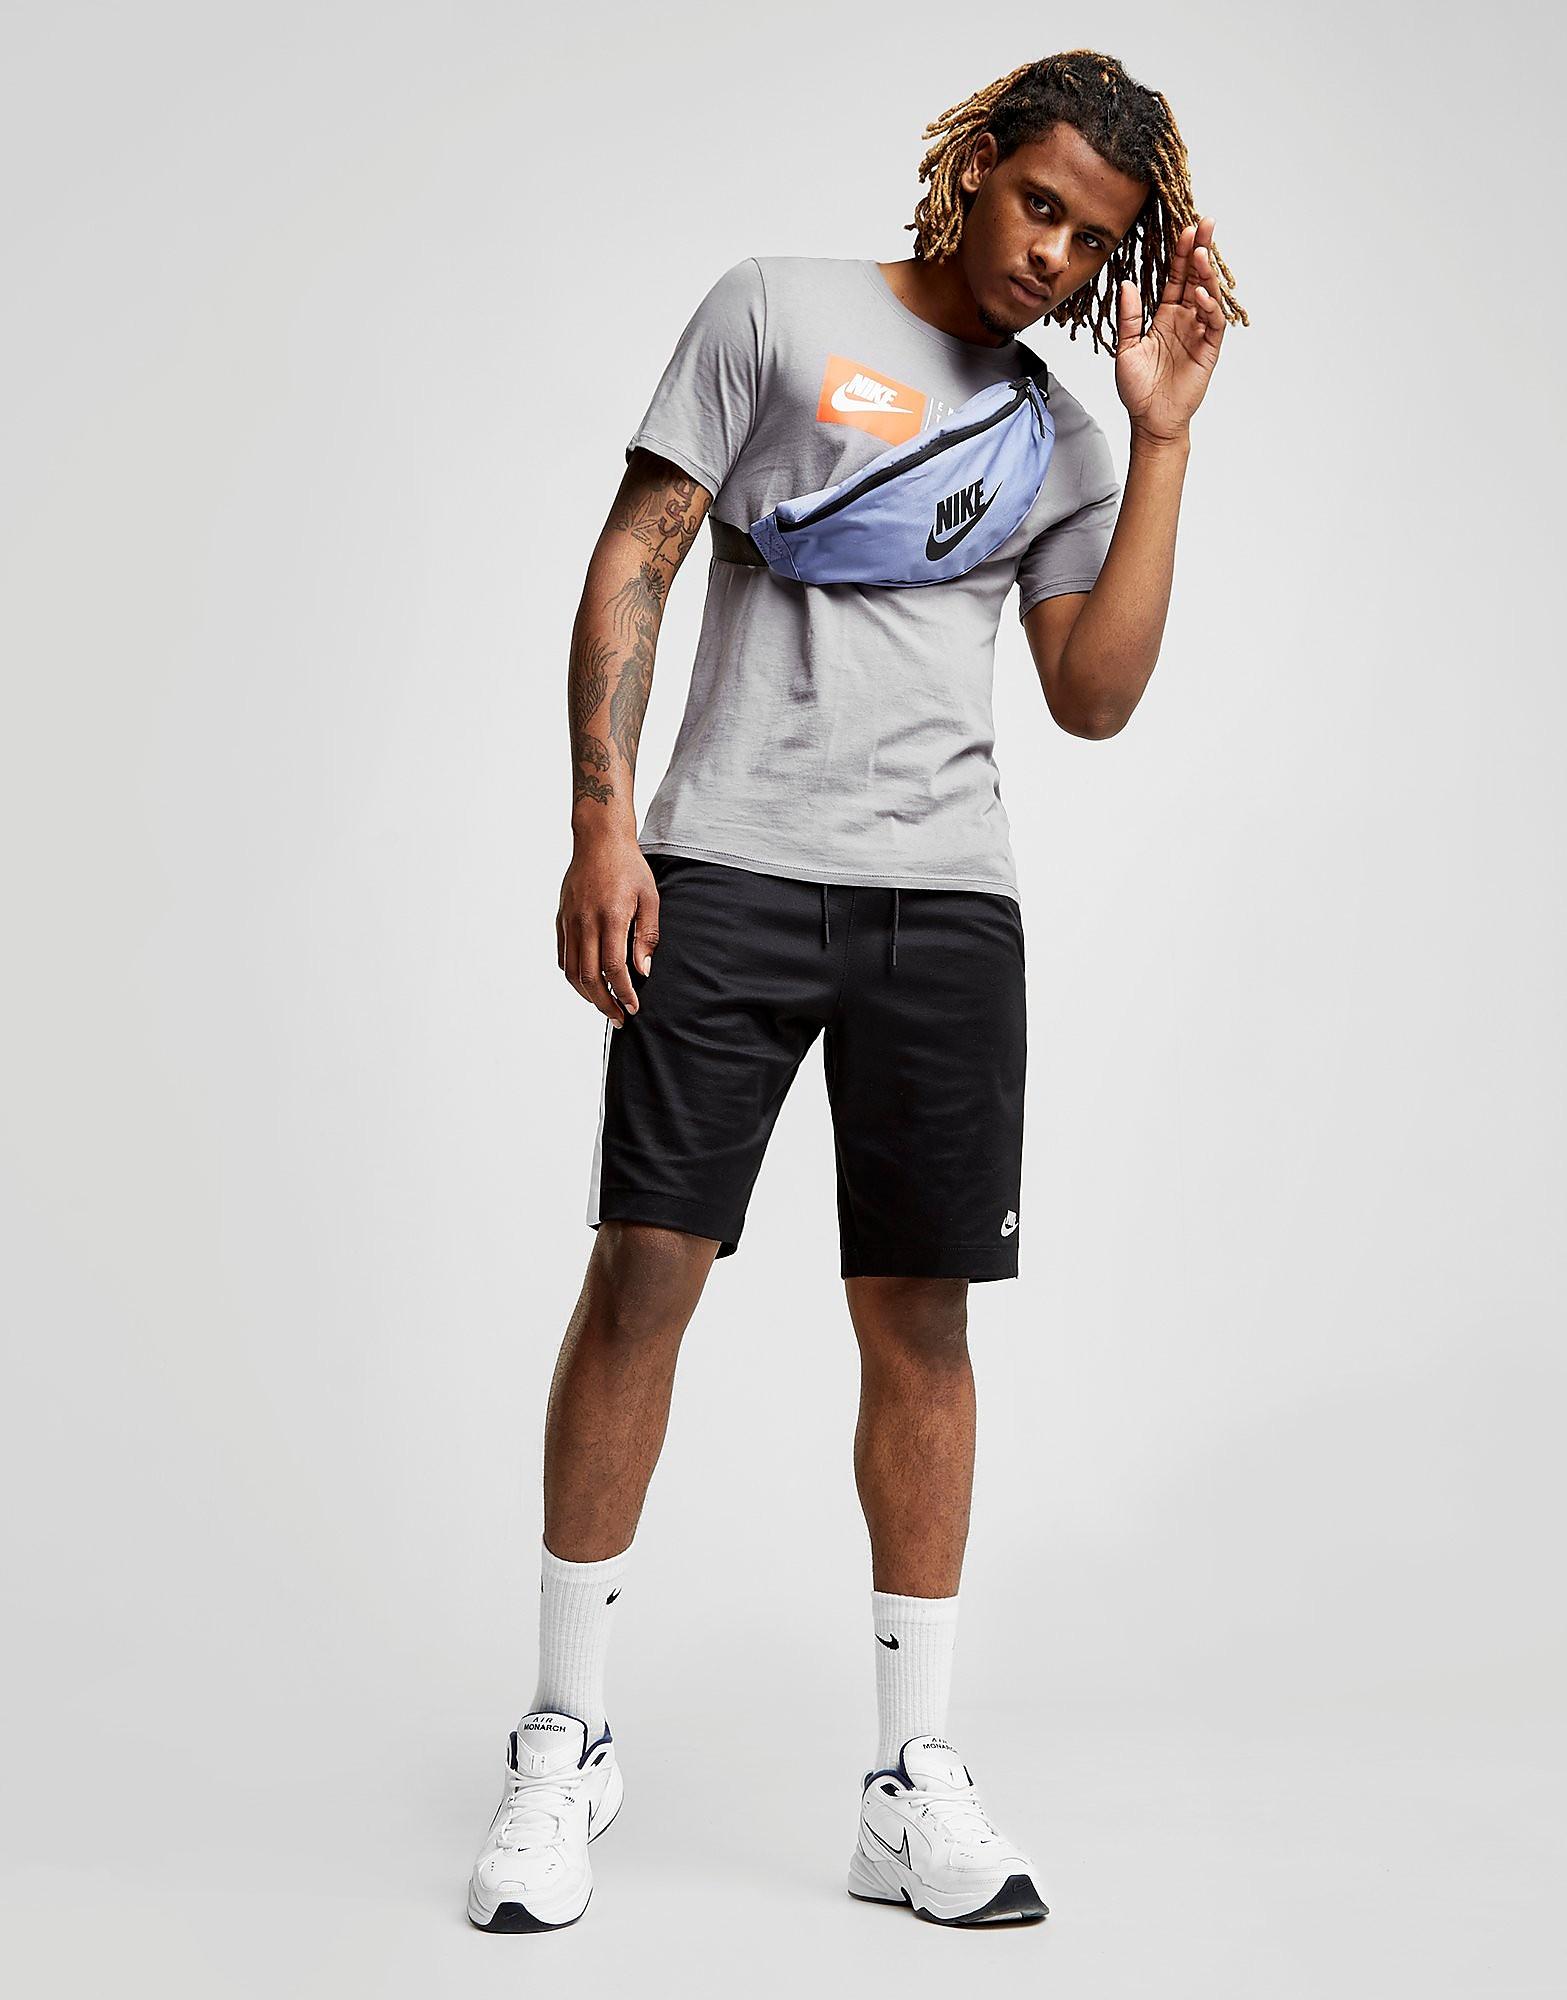 Nike Box Logo Script T-Shirt